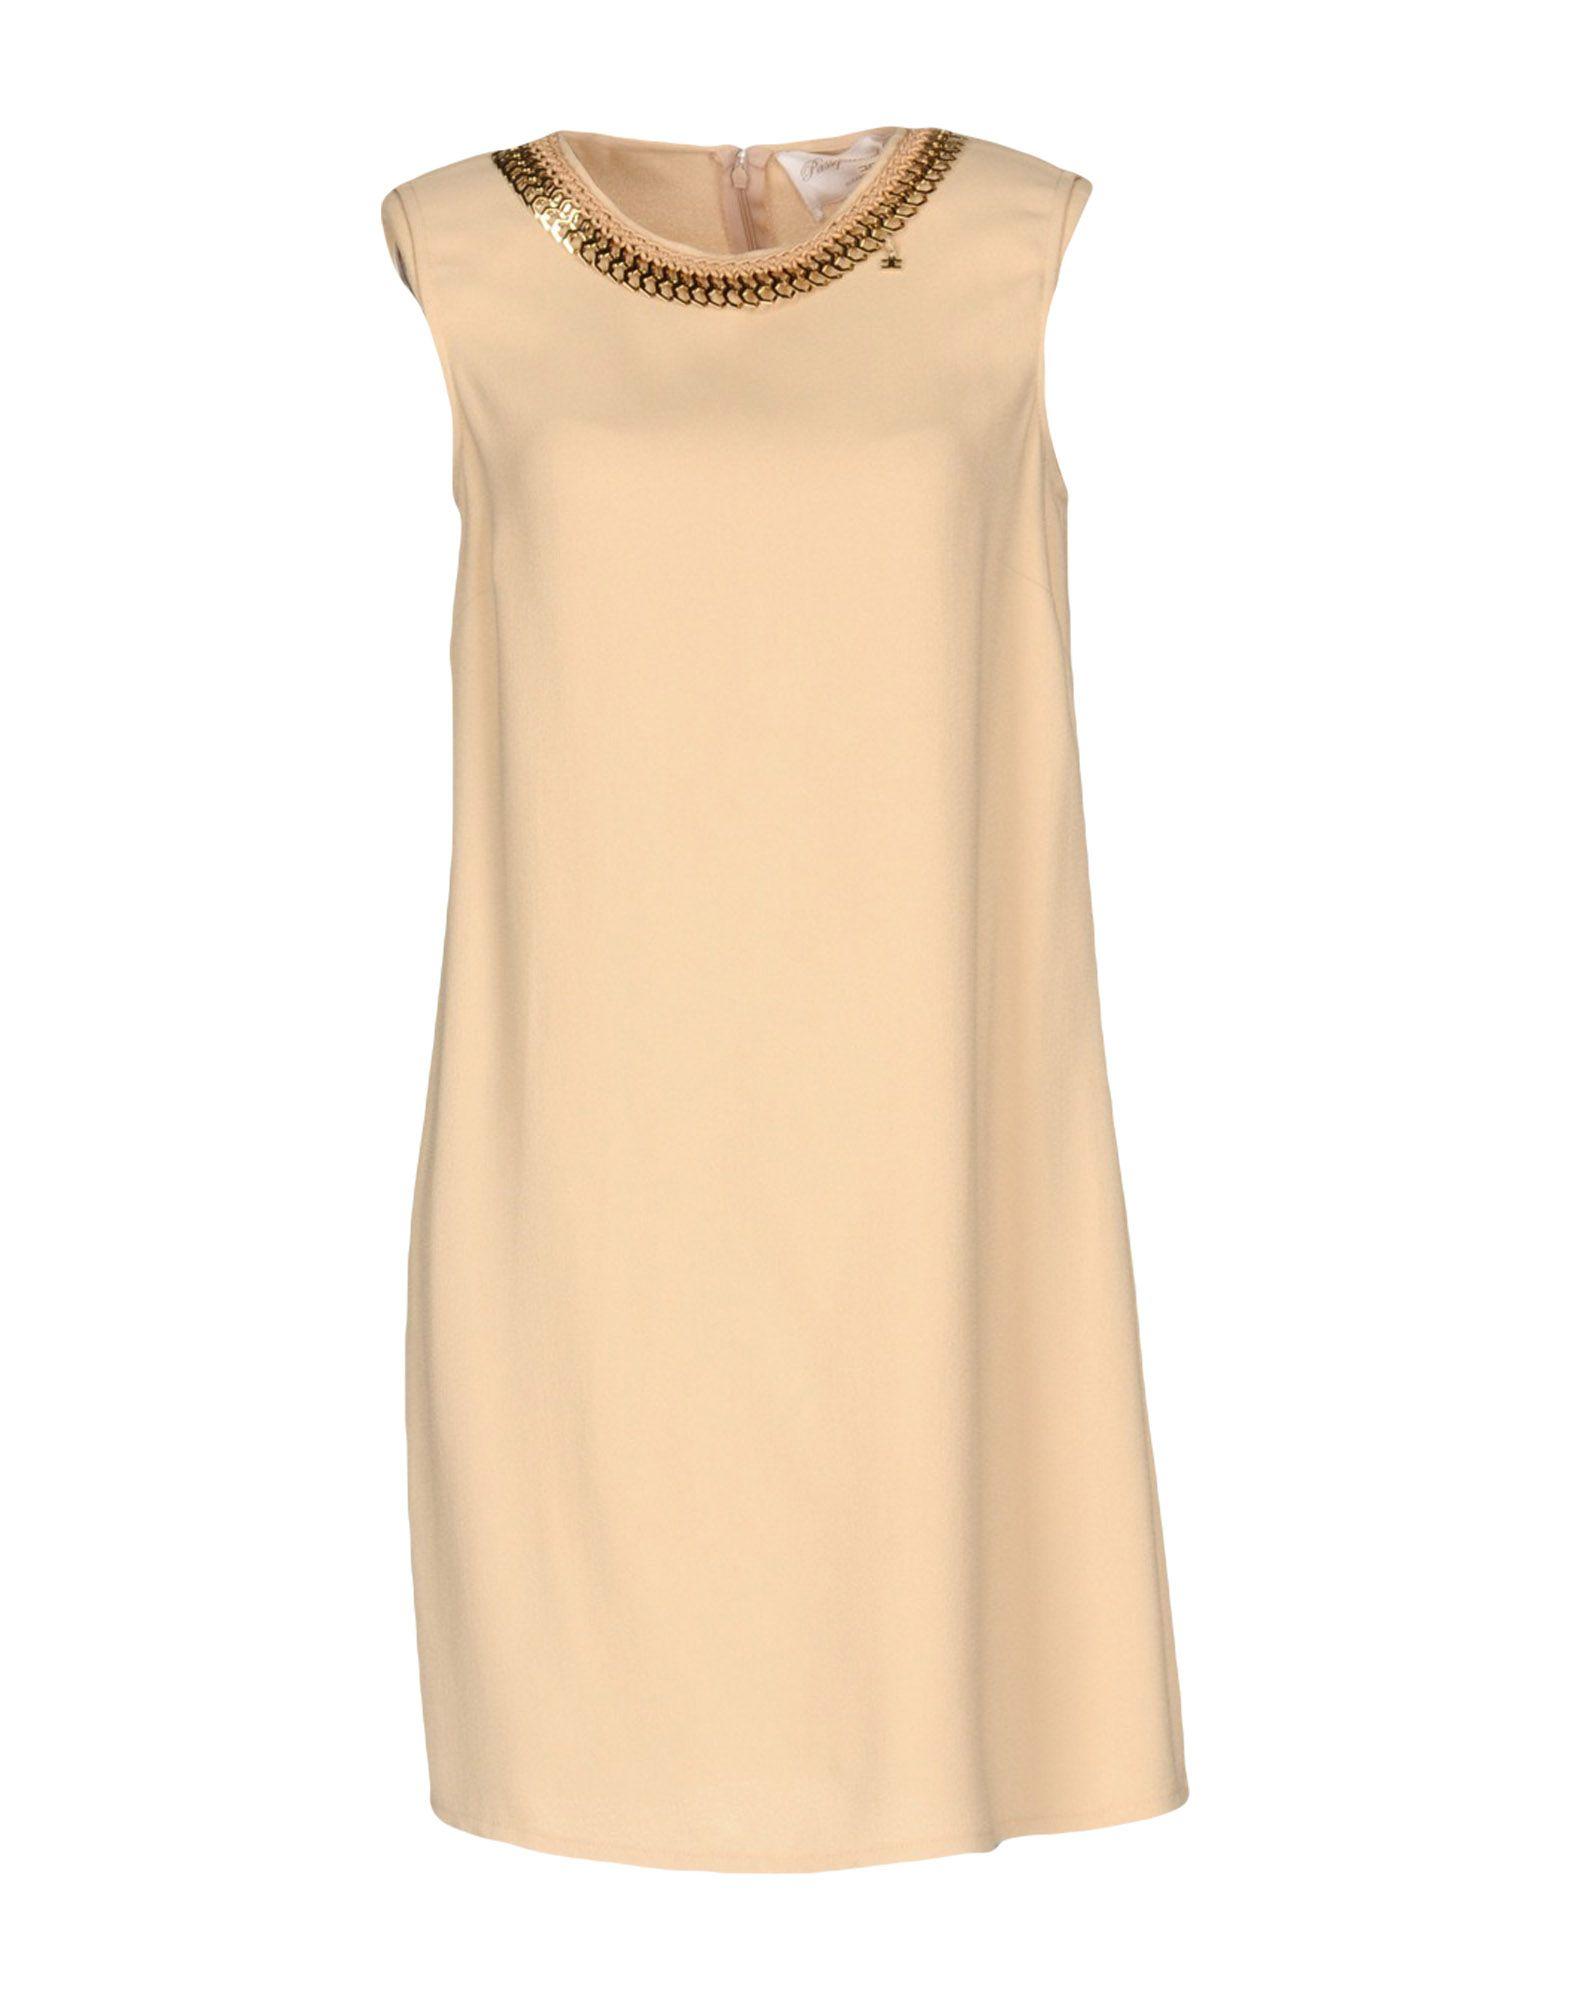 Vestito Corto Passepartout Dress By Elisabetta Fran  Celyn B. damen - 34728975BO